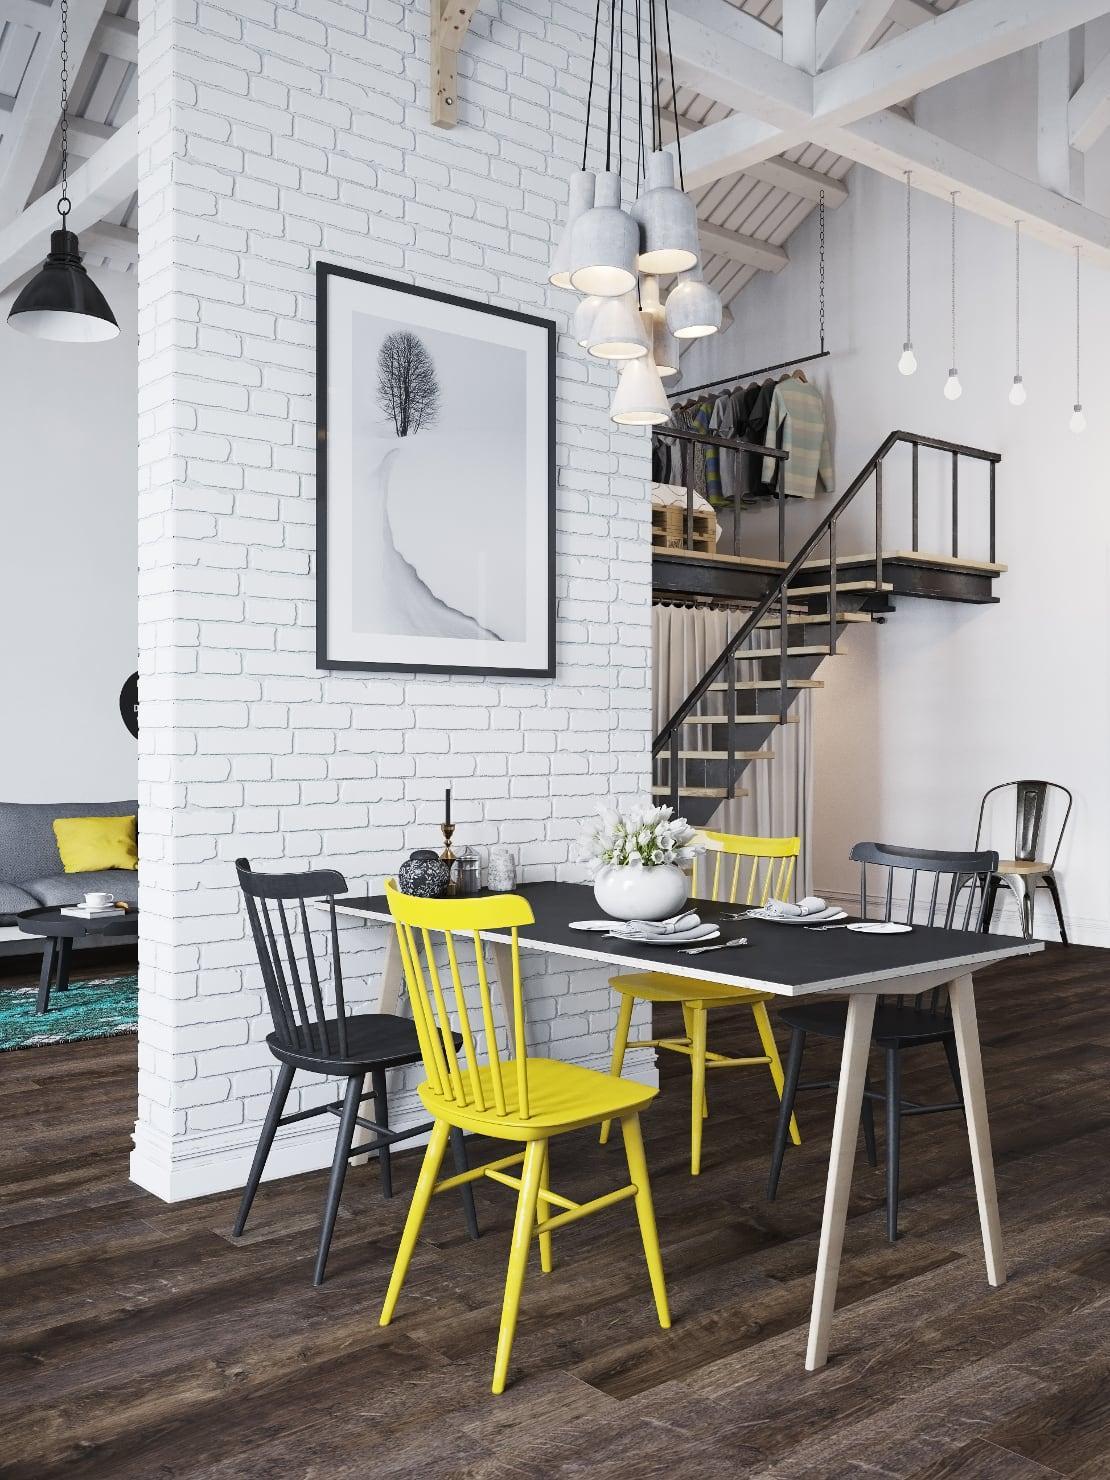 loft-nordico-praga-silla-amarilla